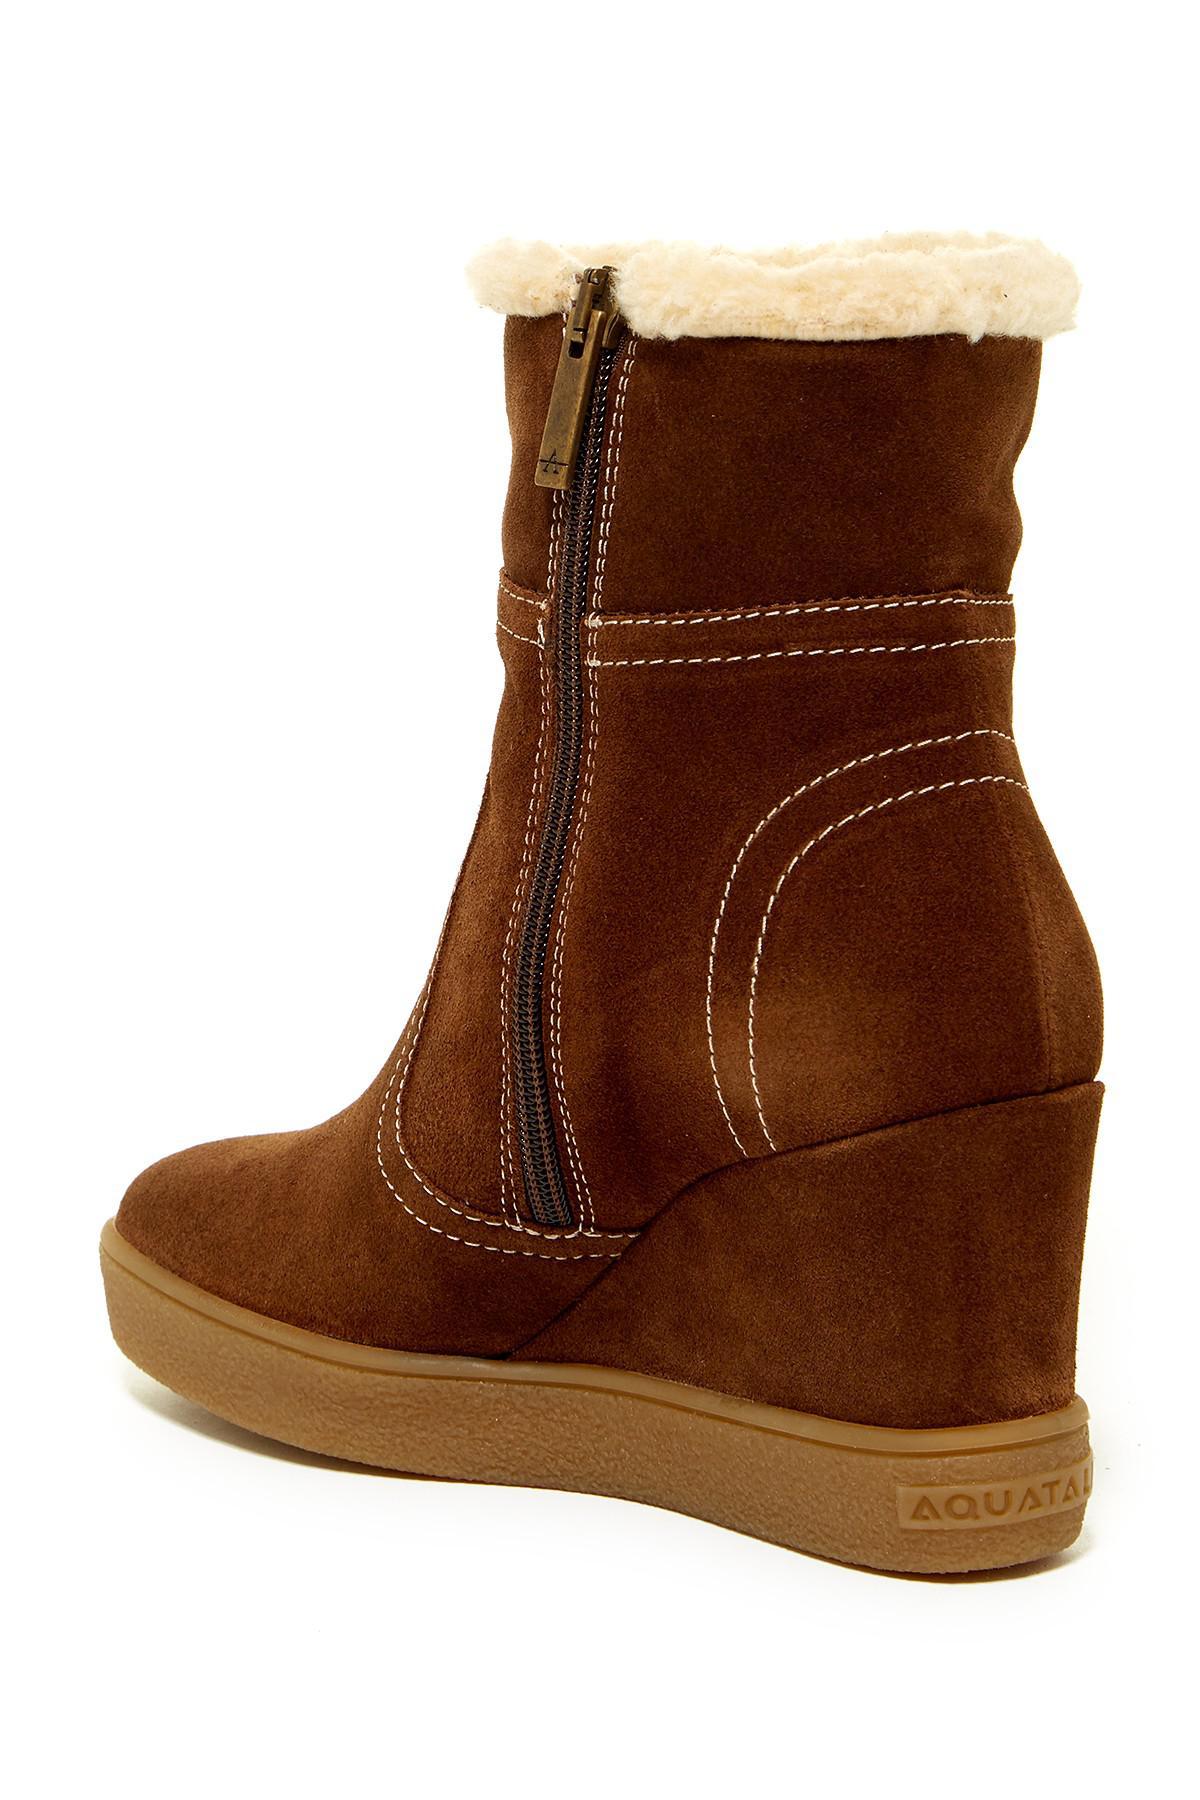 b654f4e1dd99 Aquatalia Cindy Faux Fur Wedge Boot in Brown - Lyst